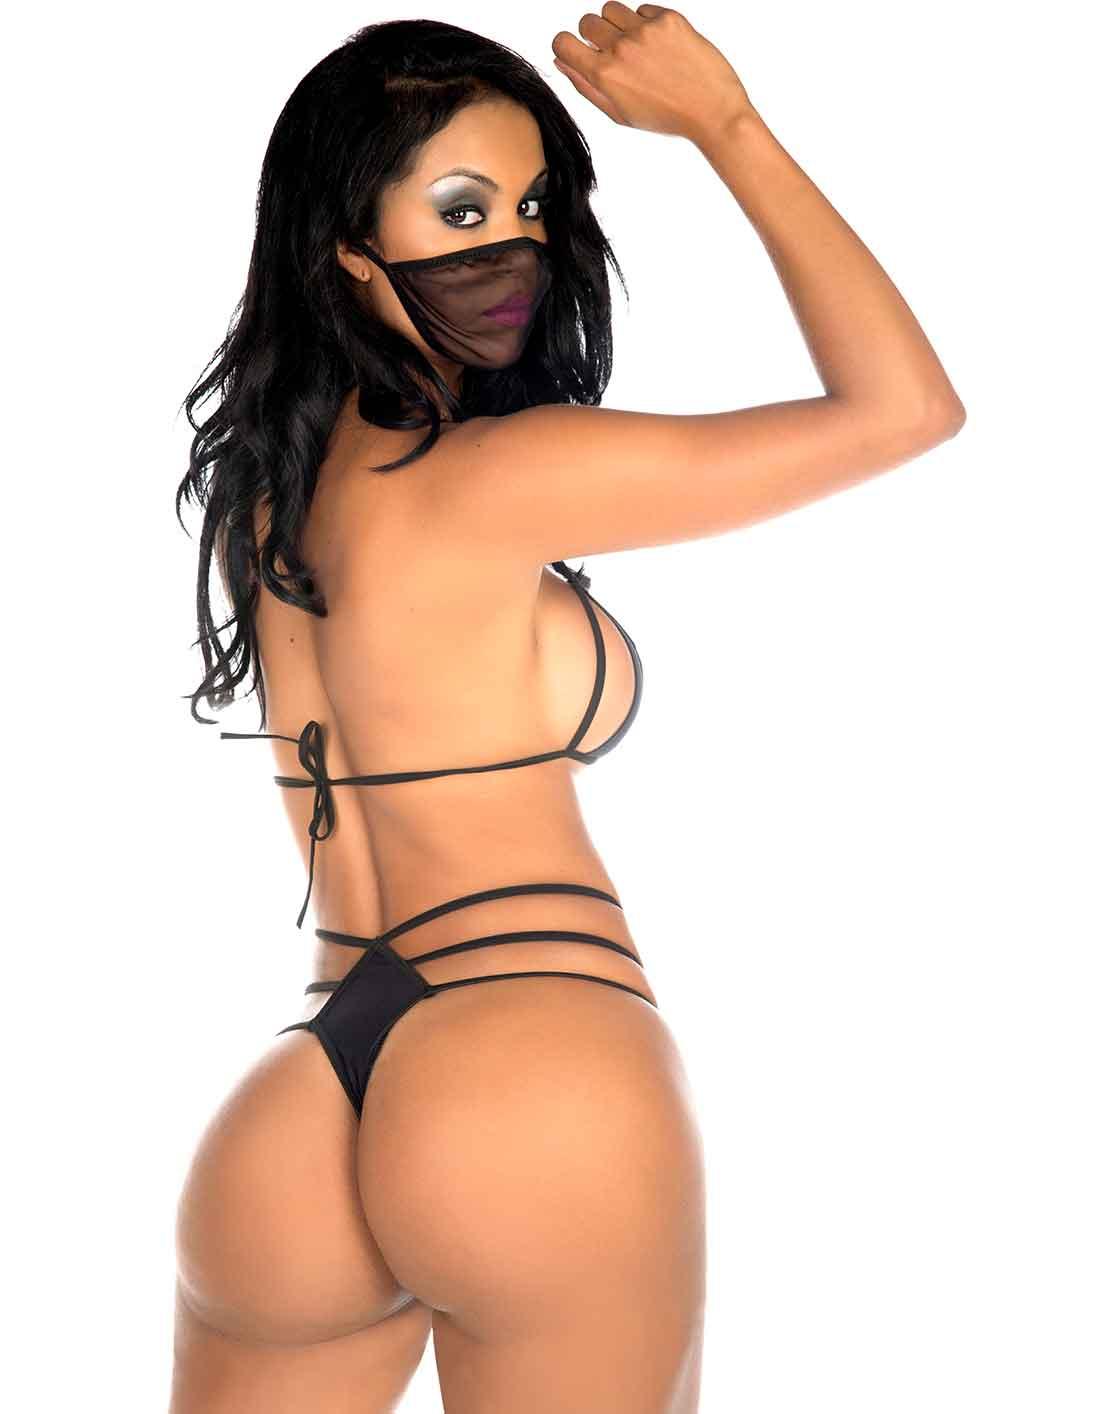 Conjunto Ninja Top + Calcinha + Máscara Preta Tropikanas